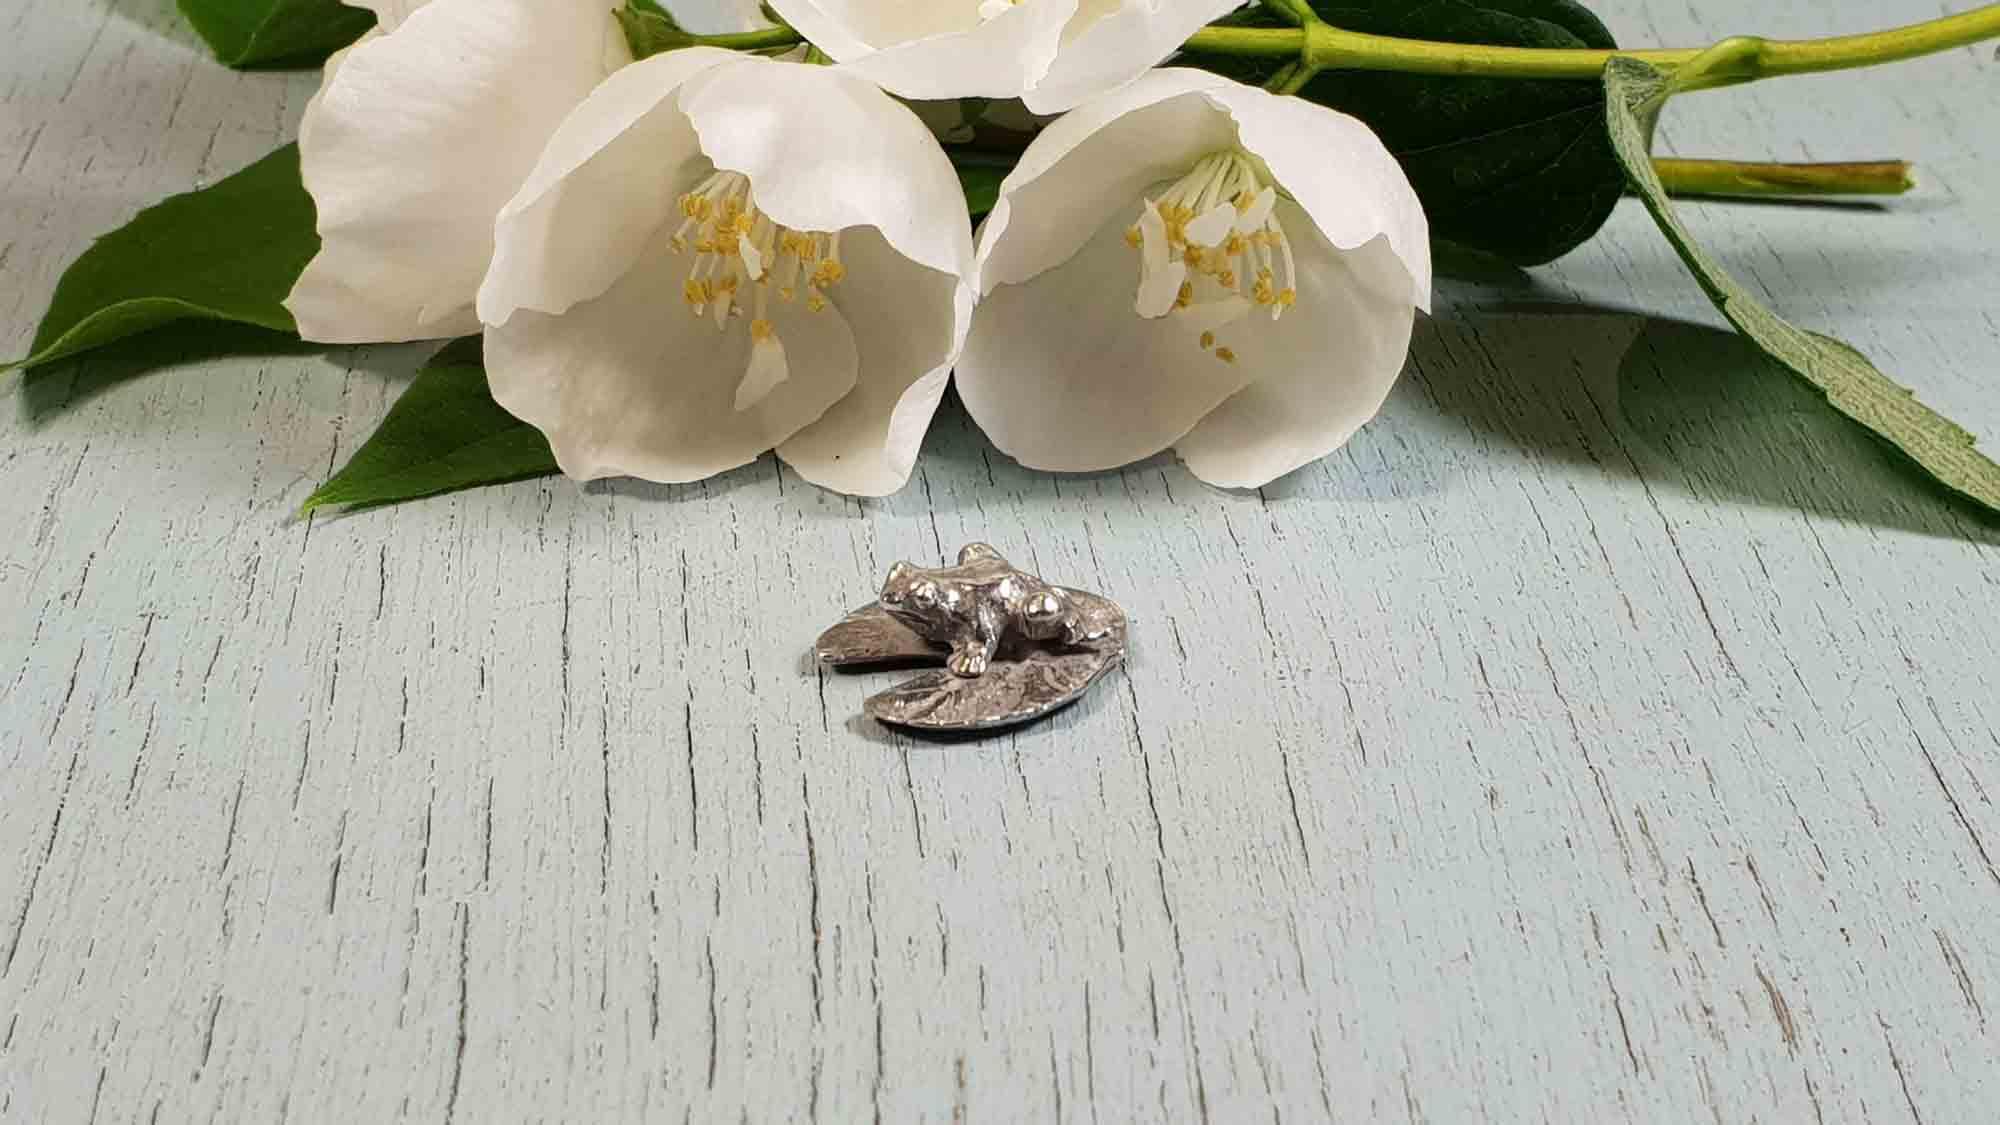 mini grenouille sur nenuphar figurine etain